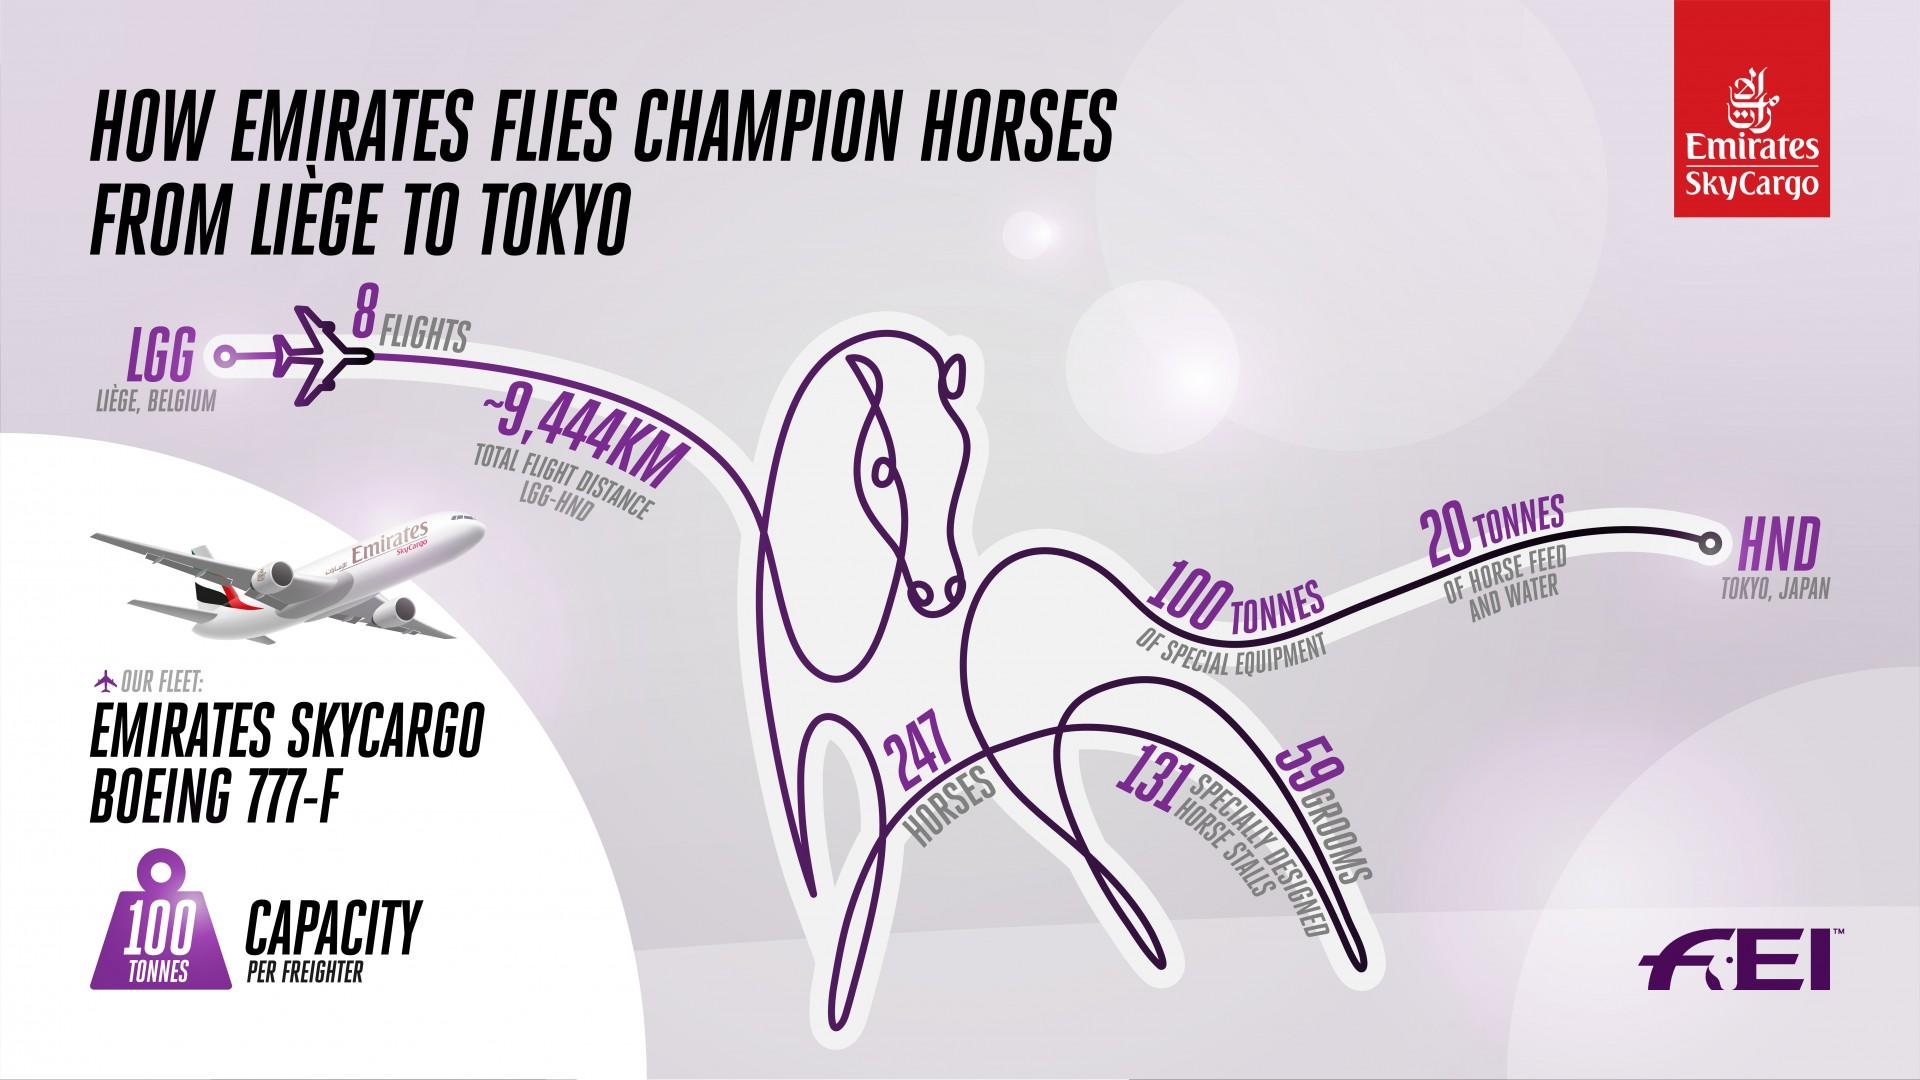 Emirates SkyCargo flies horses from Liege to Tokyo